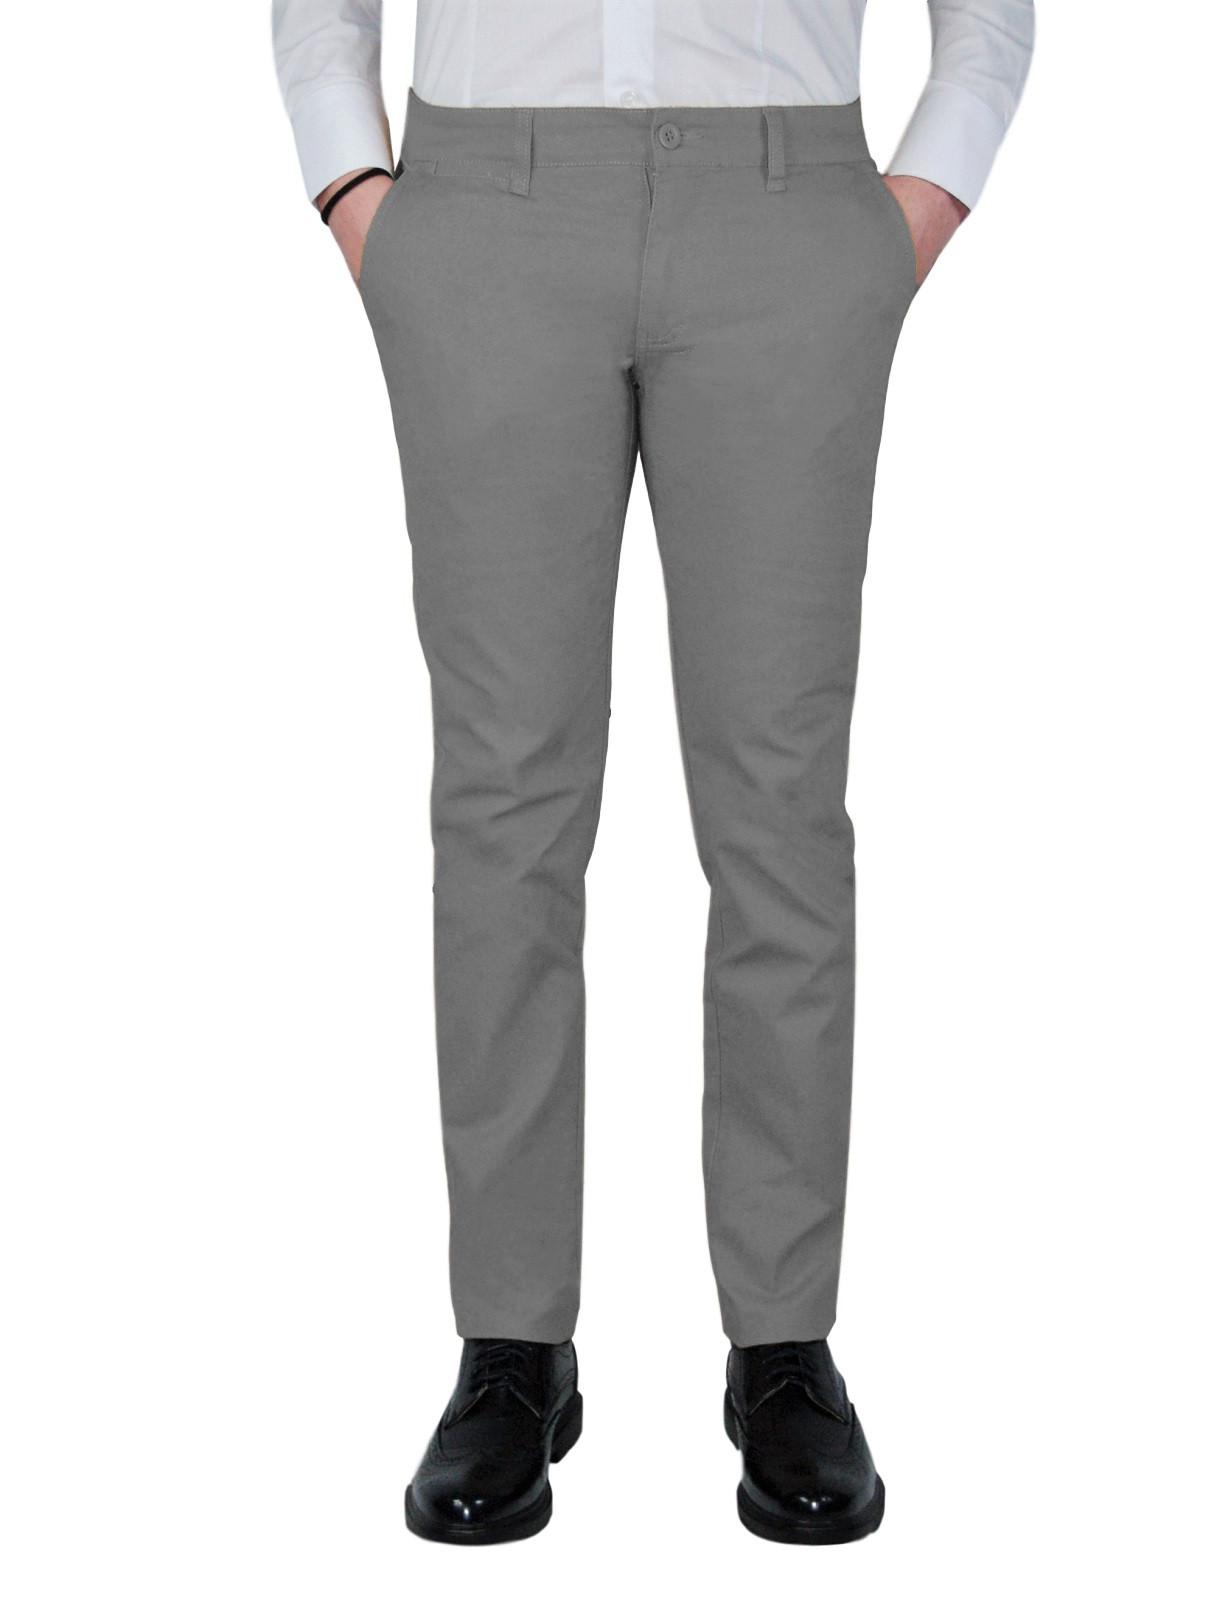 Pantalone-Uomo-Chino-Slim-fit-Primaverile-tasca-america-Bianco-Grigio-Senape-Bei miniatura 17